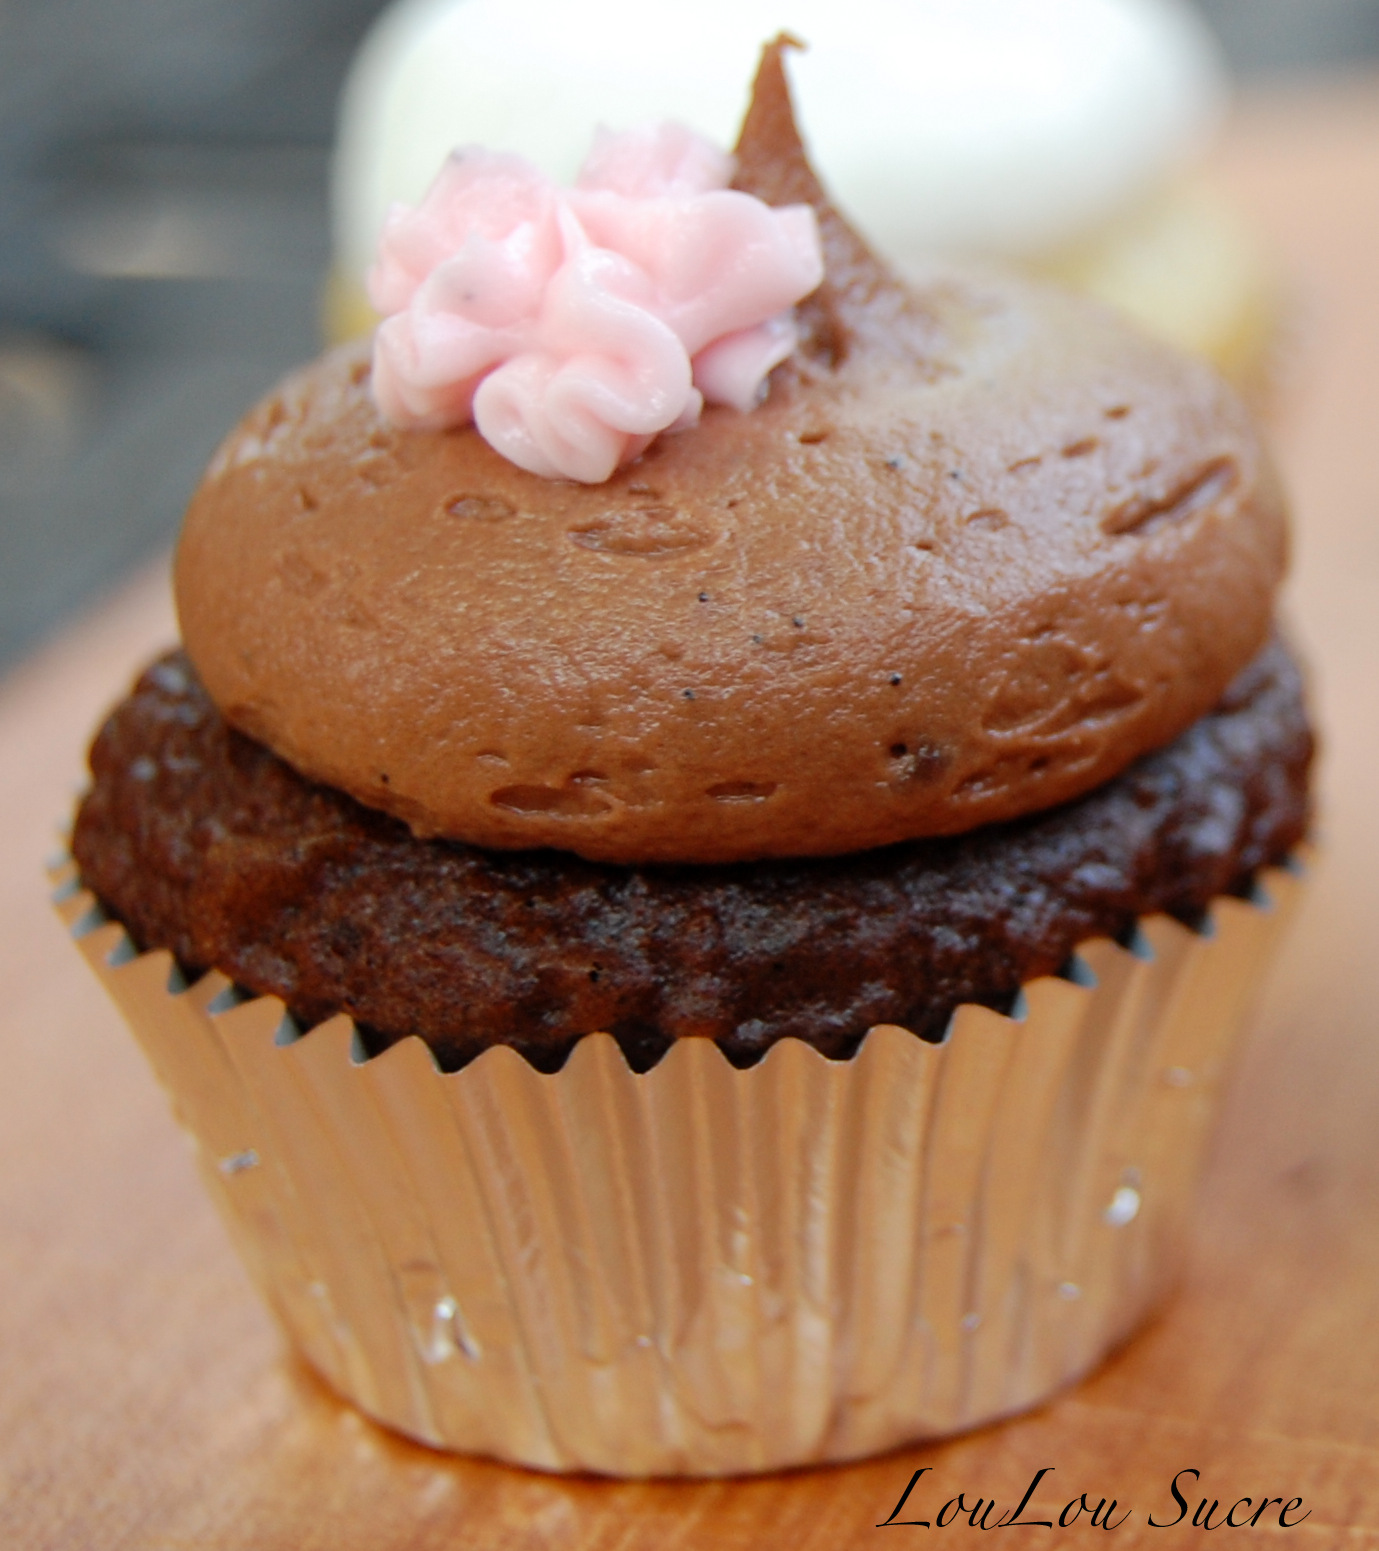 Chocolate Fudge Buttercream Frosting Recipes — Dishmaps